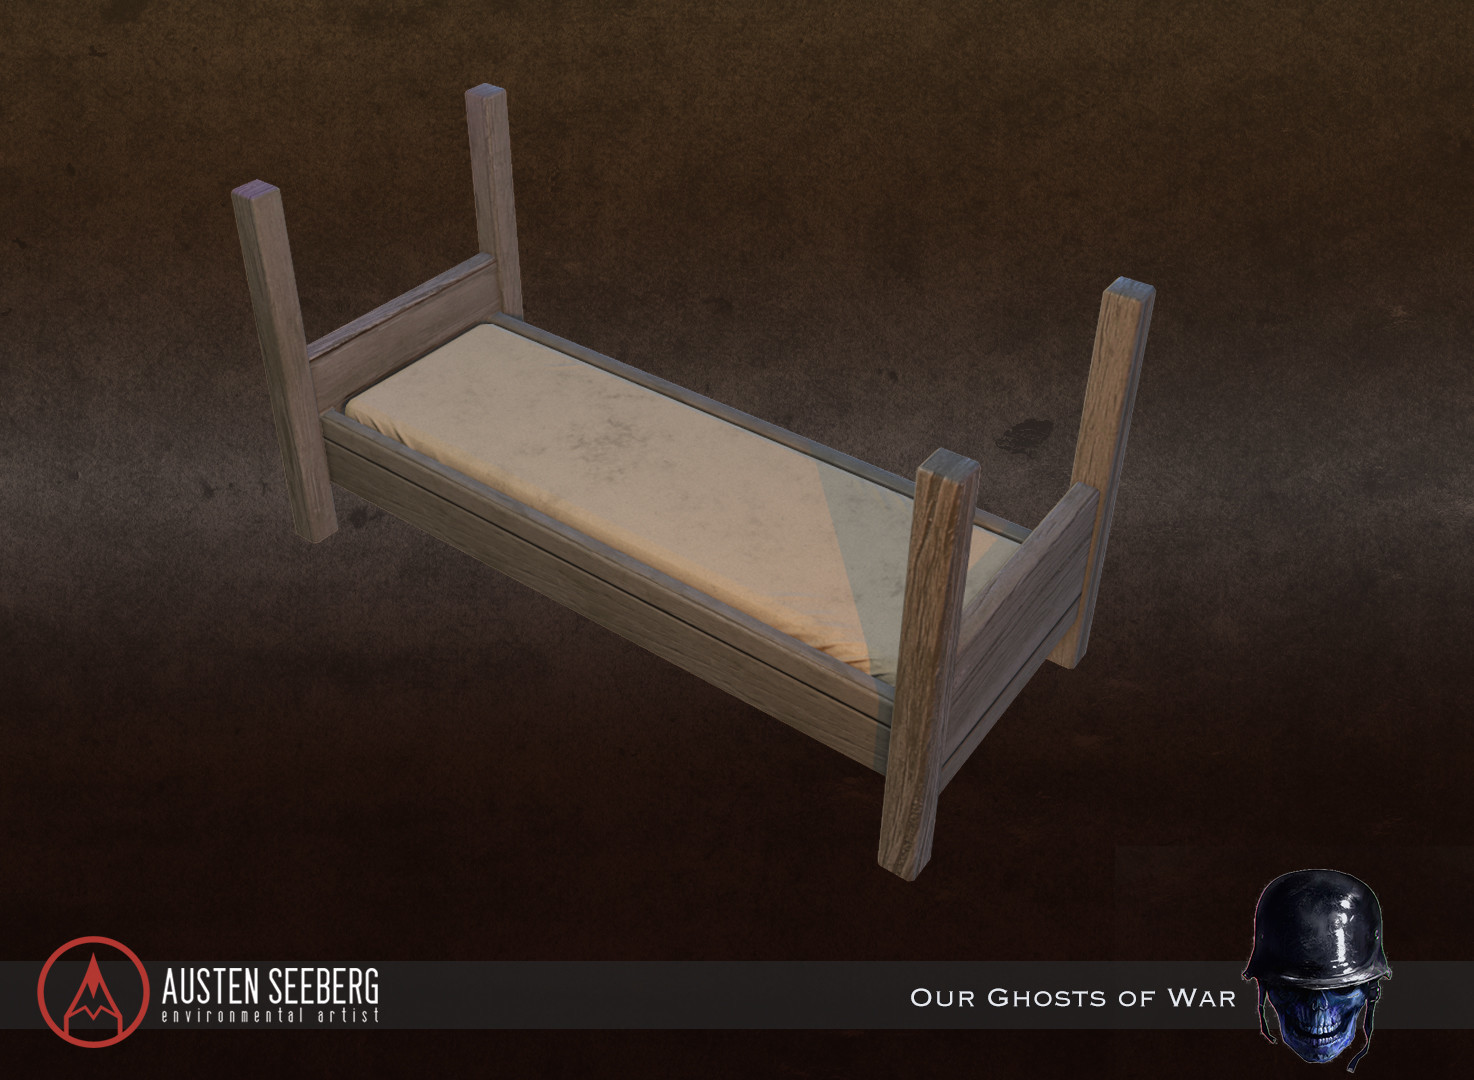 Austen seeberg austen seeberg woodenbed02comp